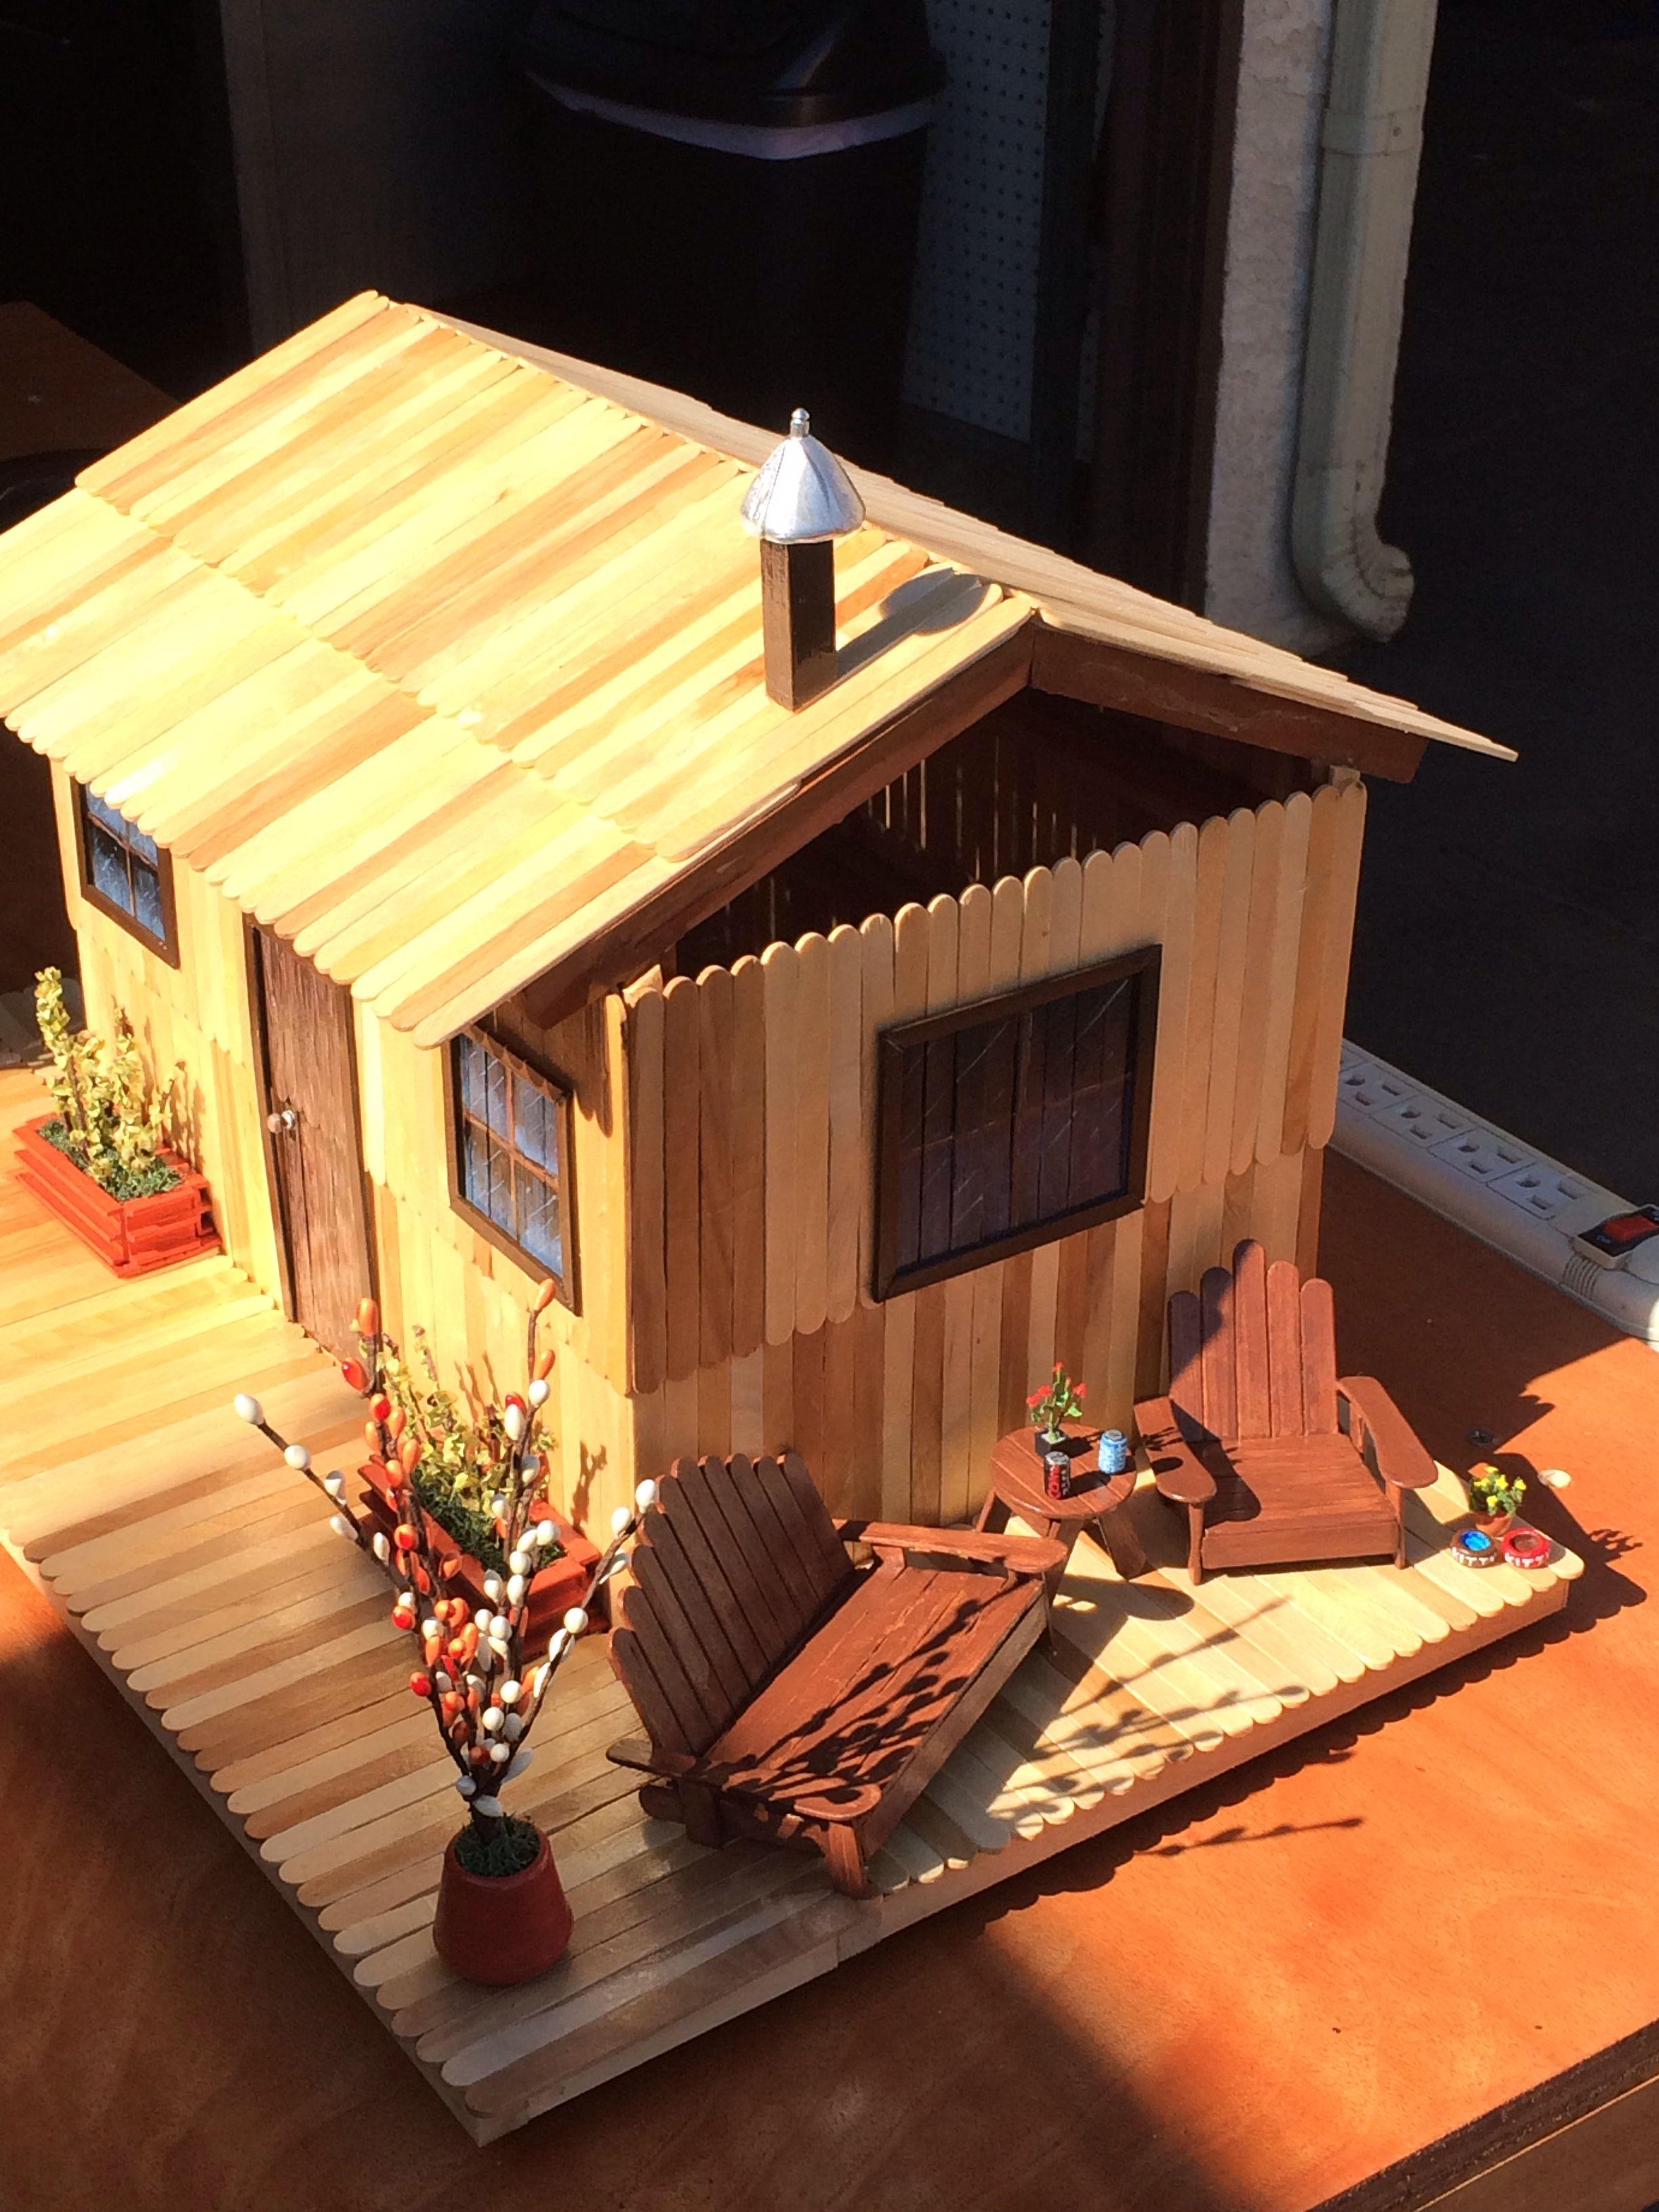 popsicle stick house my arts and crafts pinterest. Black Bedroom Furniture Sets. Home Design Ideas